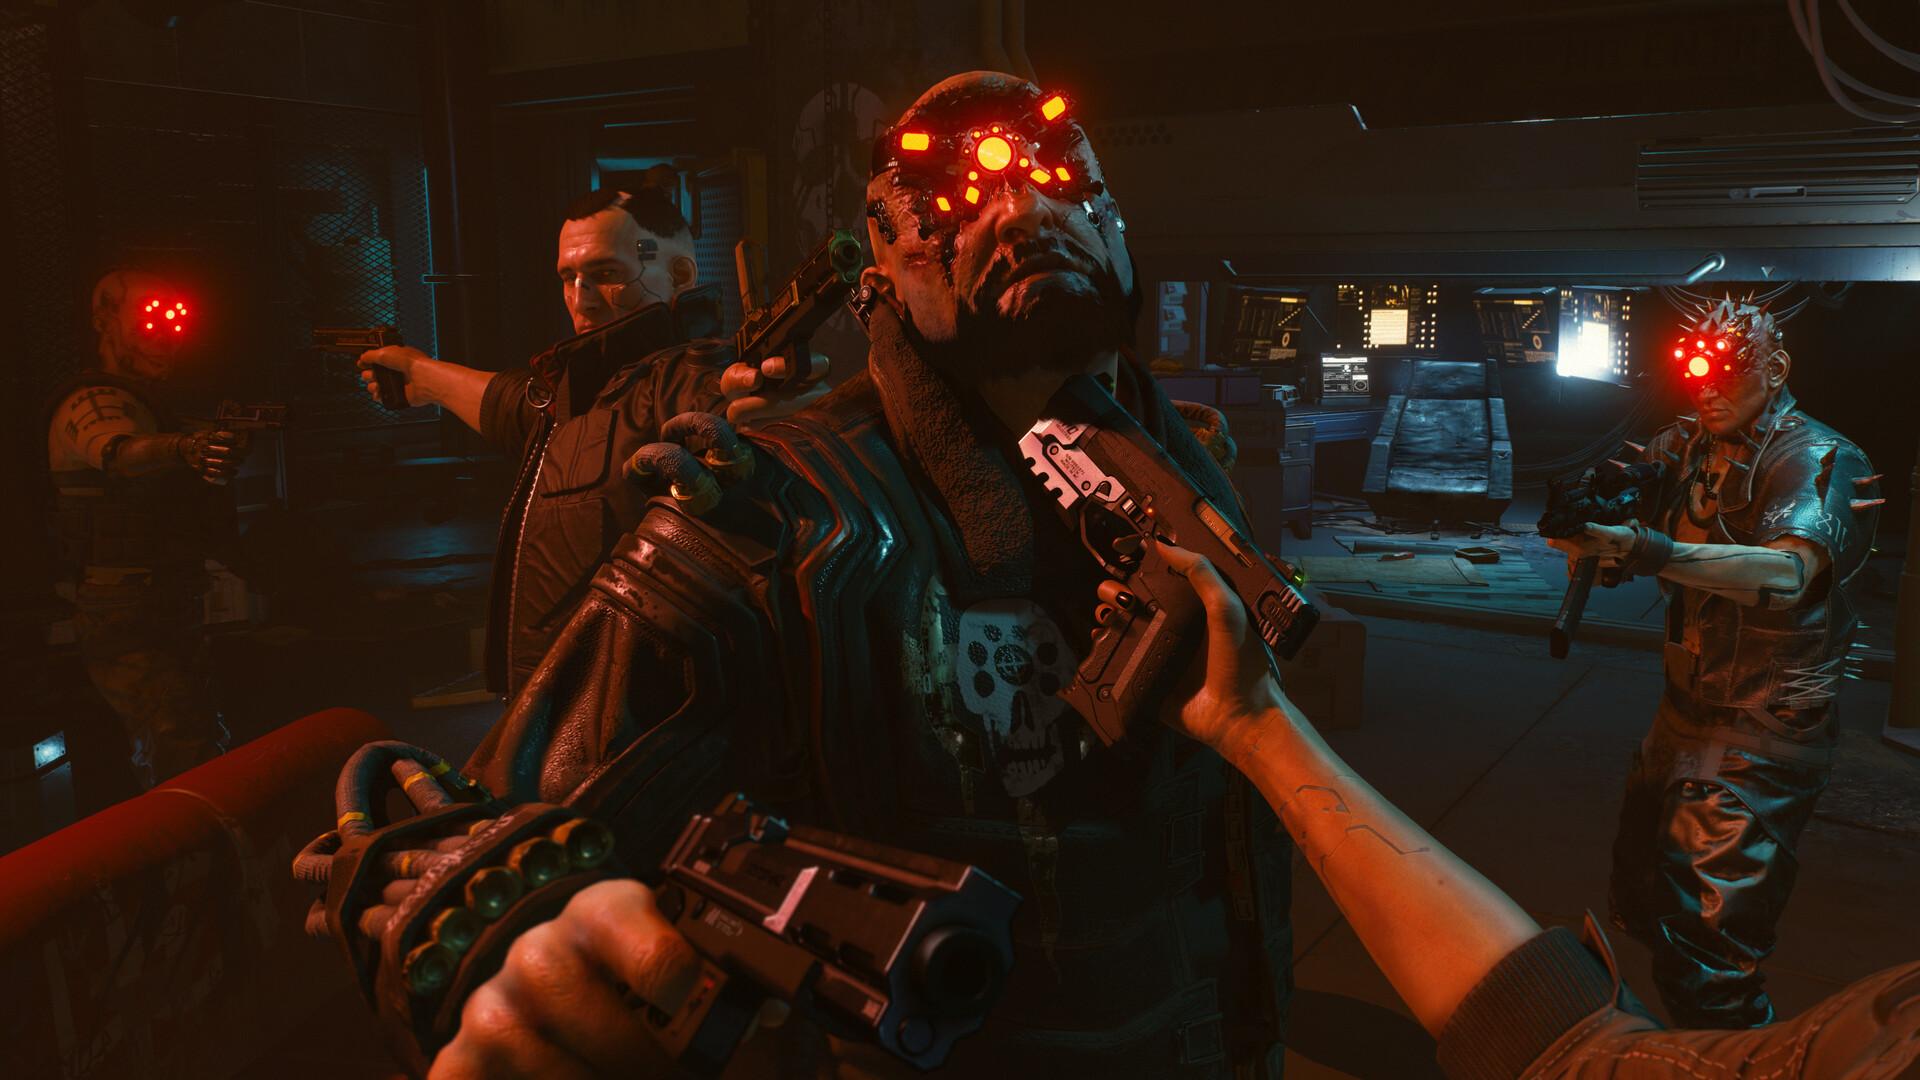 Cyberpunk 2077 [GoG] [2020|Rus|Eng|Multi18]